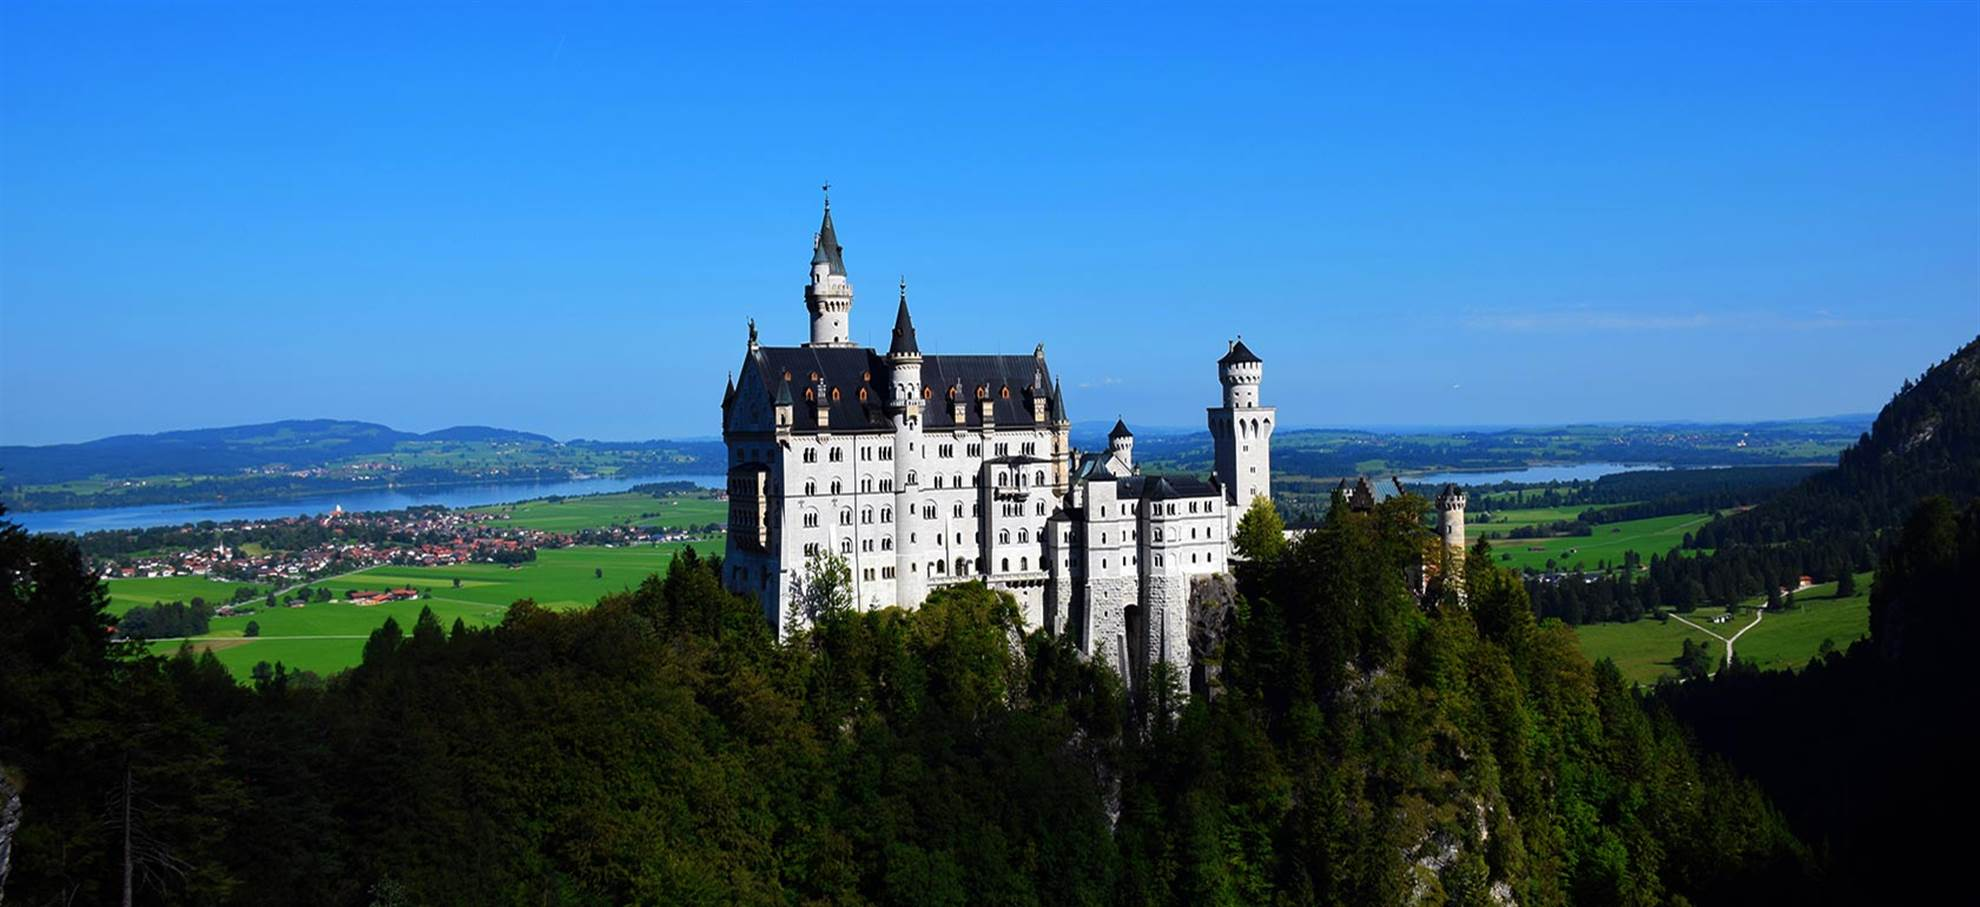 Ingressos Salte a Fila no Castelo Neuschwanstein (Ingressos da tarde)